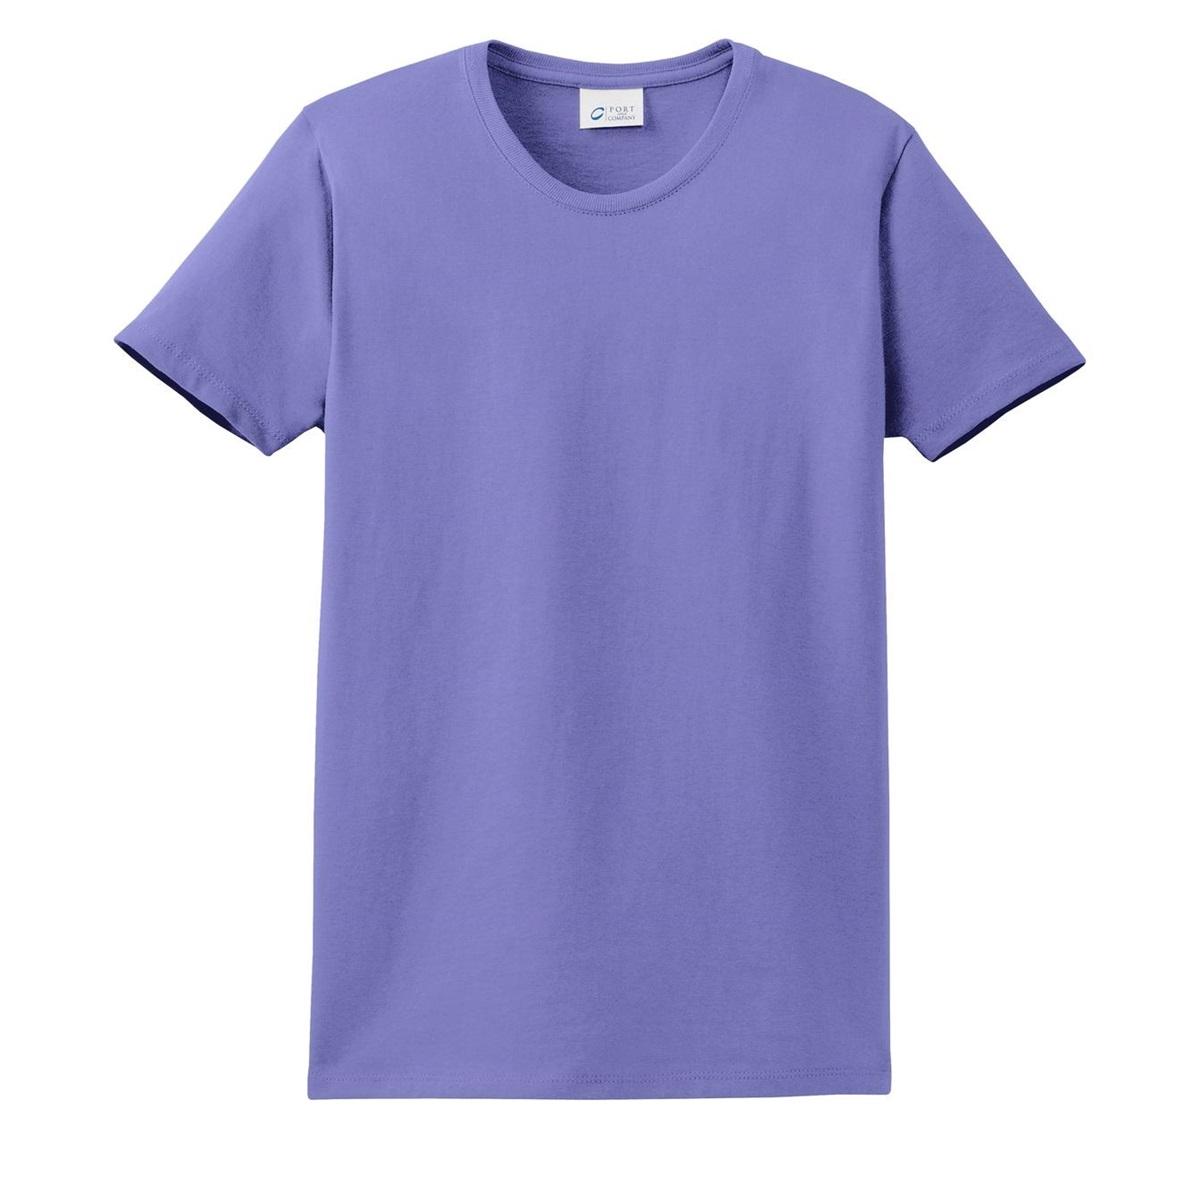 port company lpc61 ladies essential t shirt violet. Black Bedroom Furniture Sets. Home Design Ideas